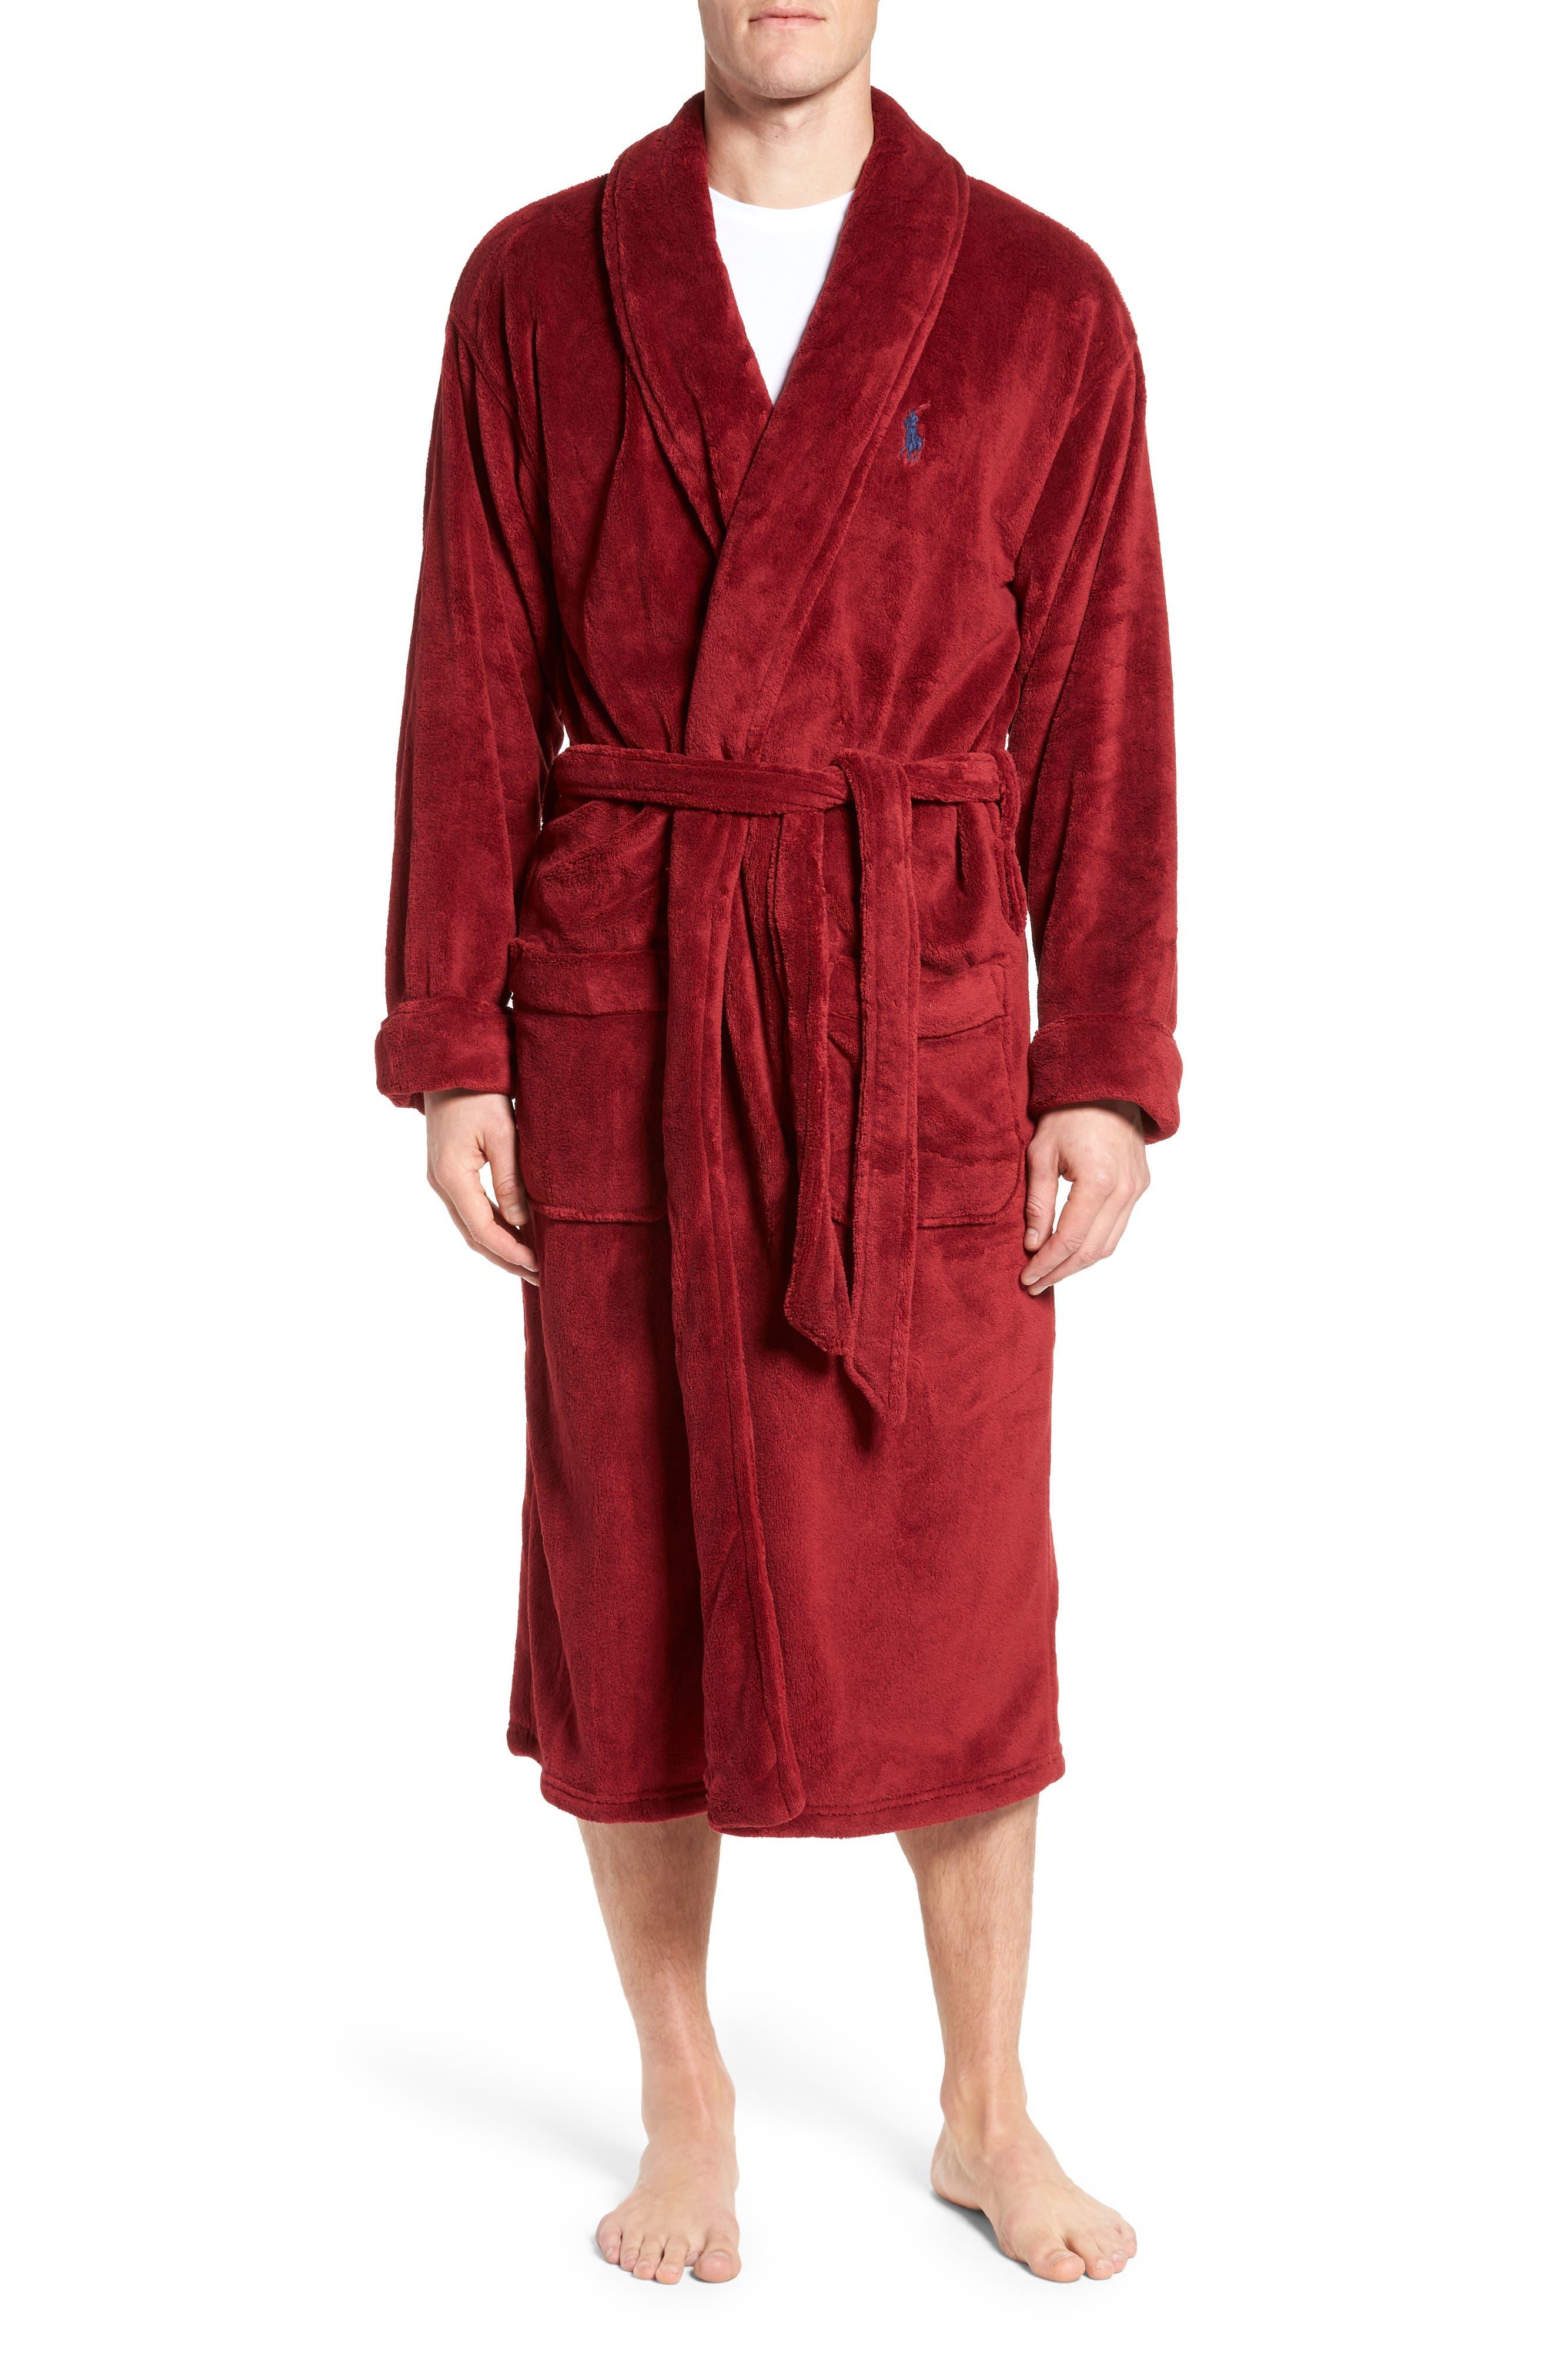 Polo Ralph Lauren Microfiber Robe